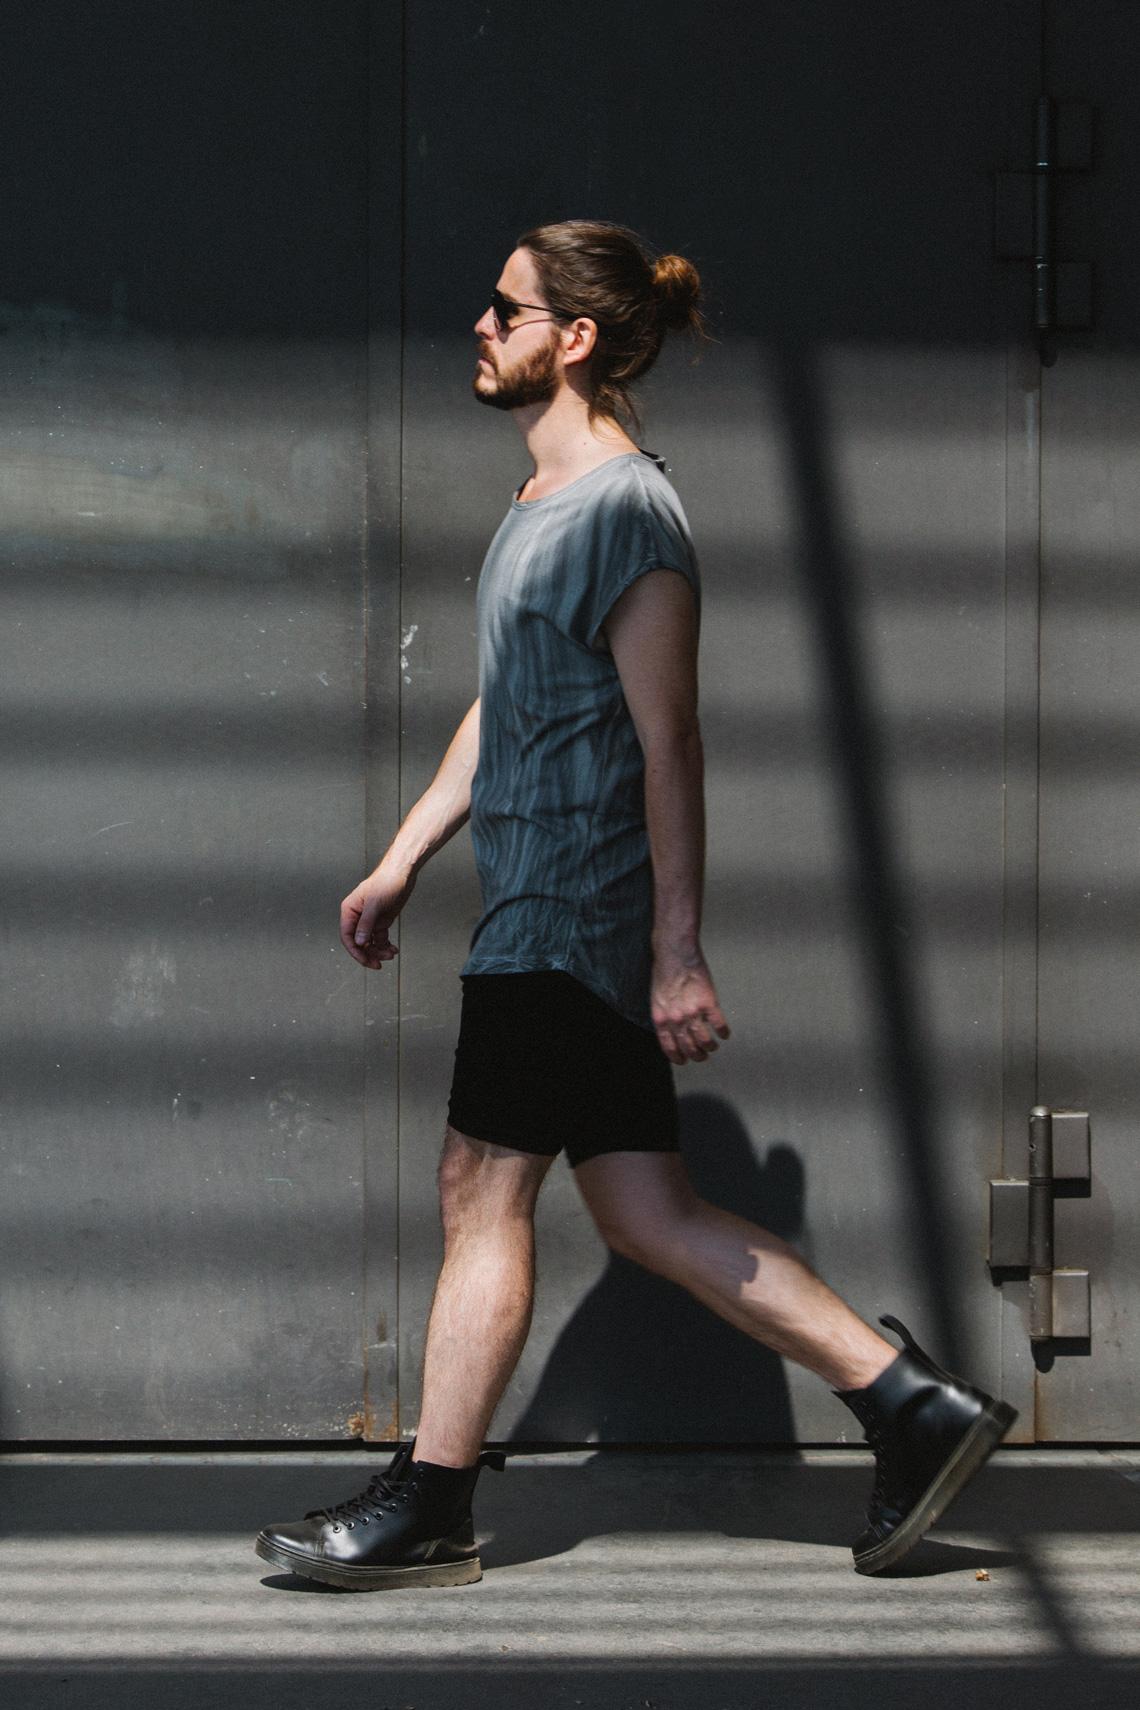 Kaisers-neue-kleider_Maennermodeblog_Male-Fashion-Style-Blog_Grunge-Outfit_Jeansshort_Docs_Fruehlingslook-Rockstar-Attitude_02